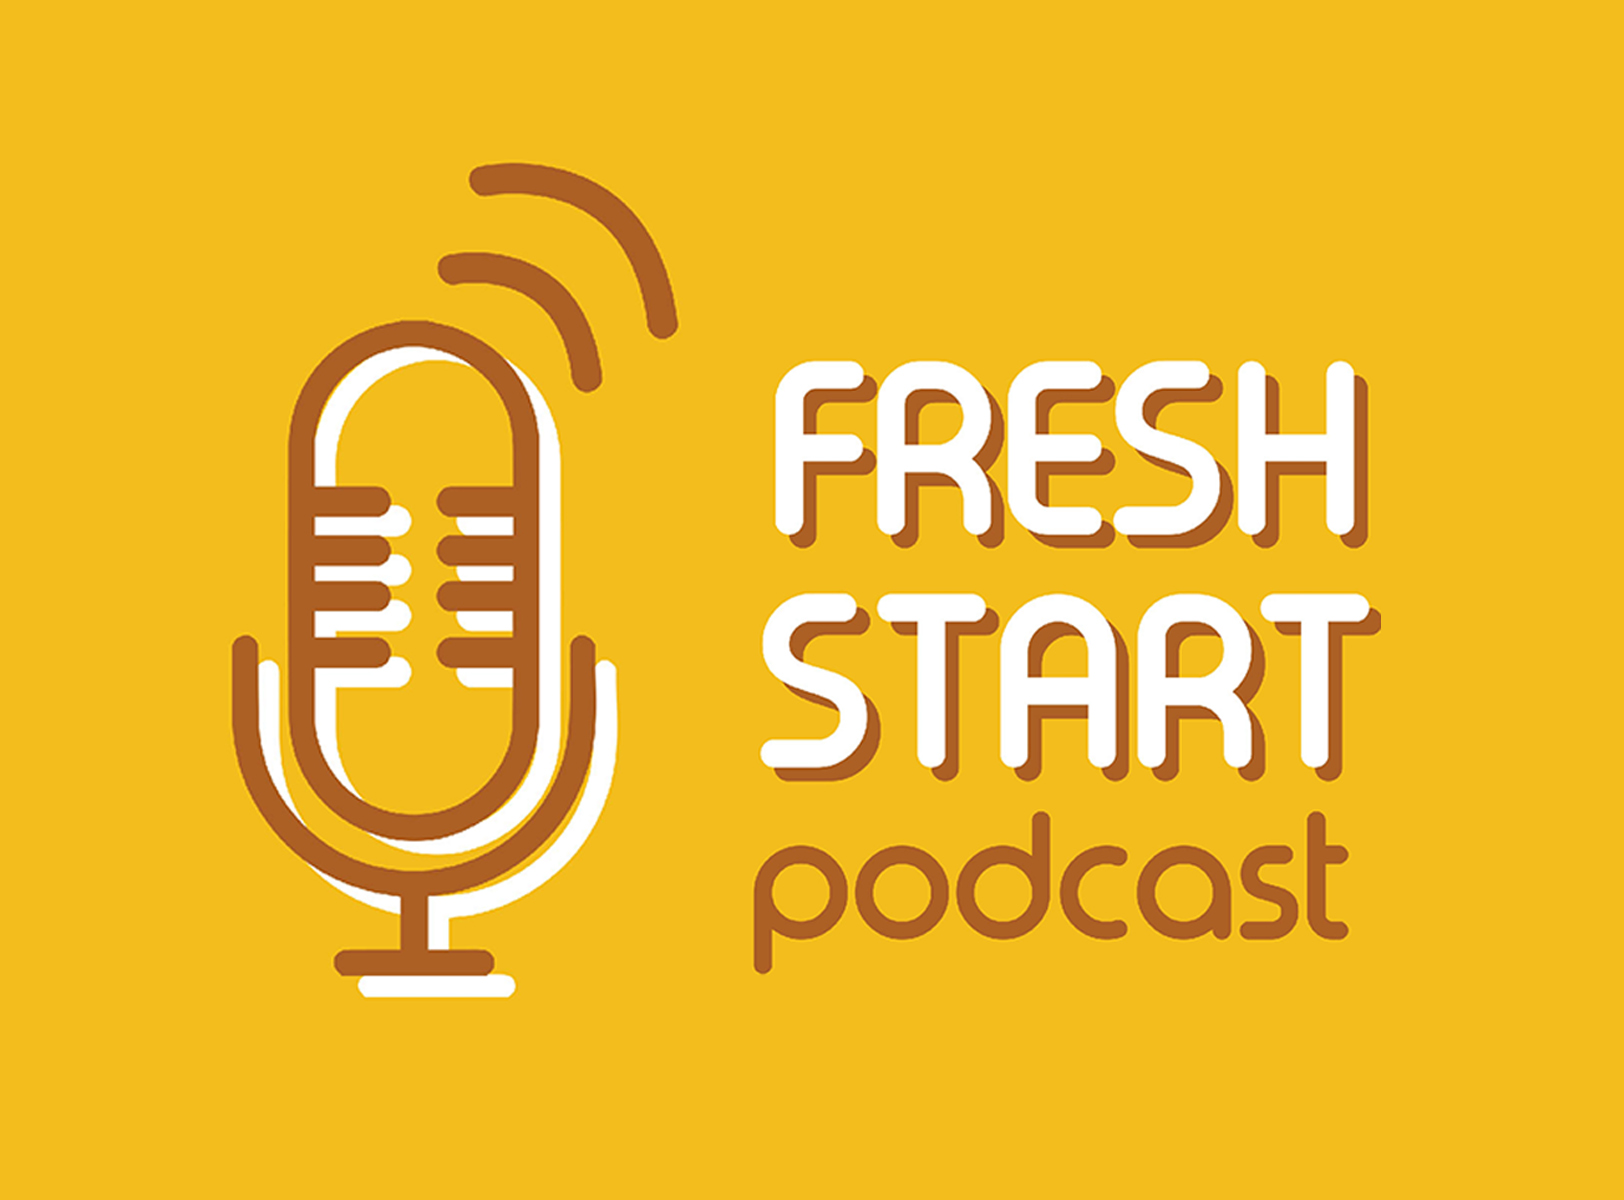 Fresh Start: Podcast News (8/19/2019 Mon.)